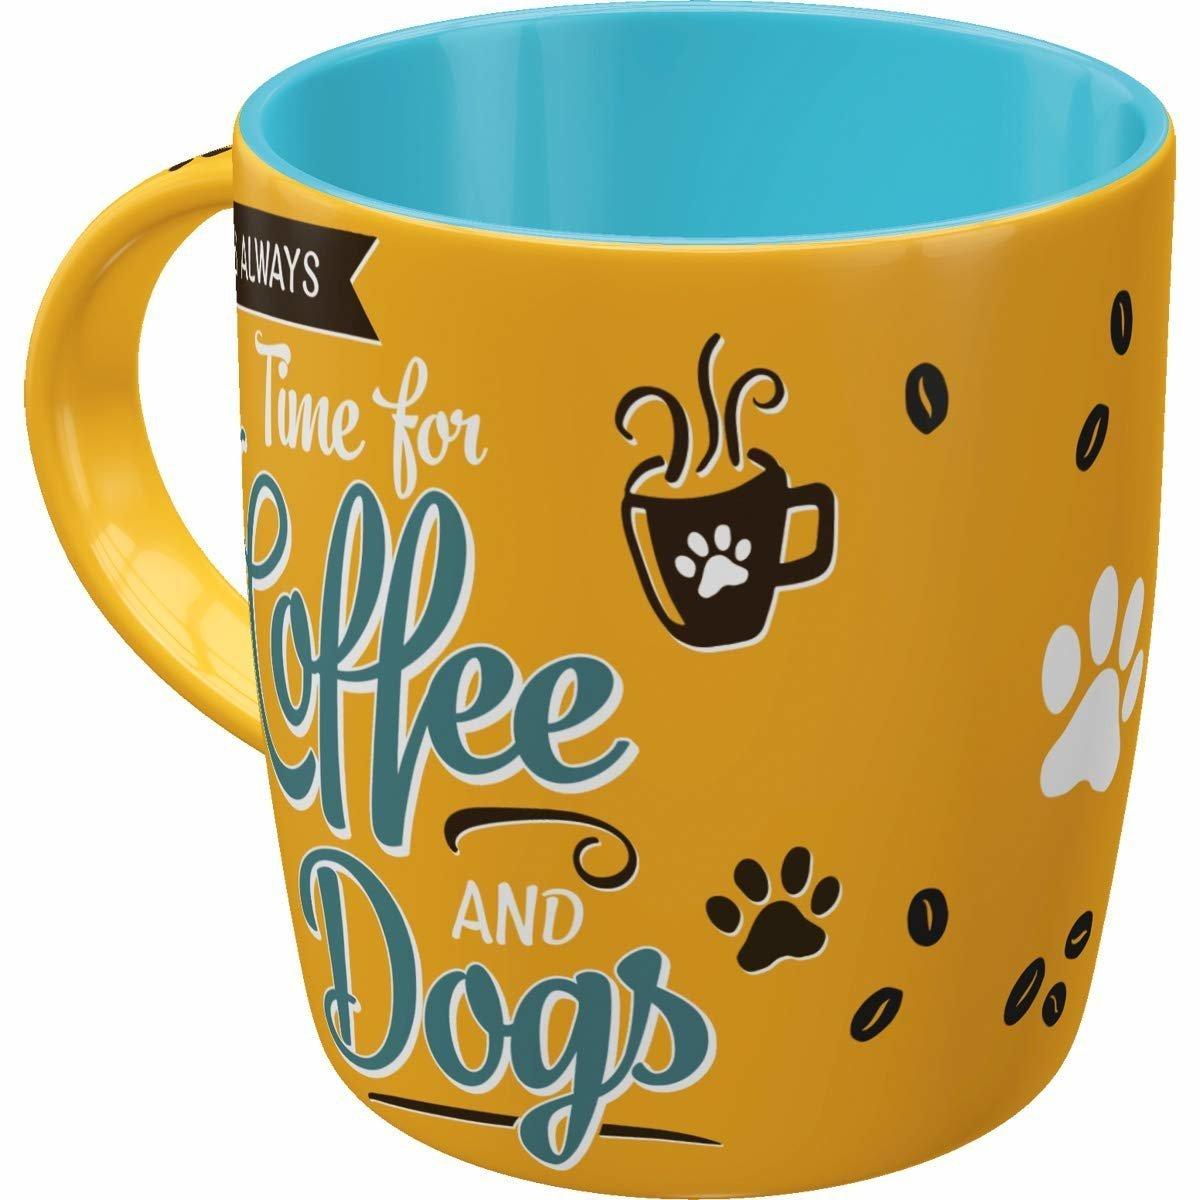 Nostalgic-Art Kaffebecher Coffee and Dogs, PfotenSchild - Coffee and Dogs, Tasse